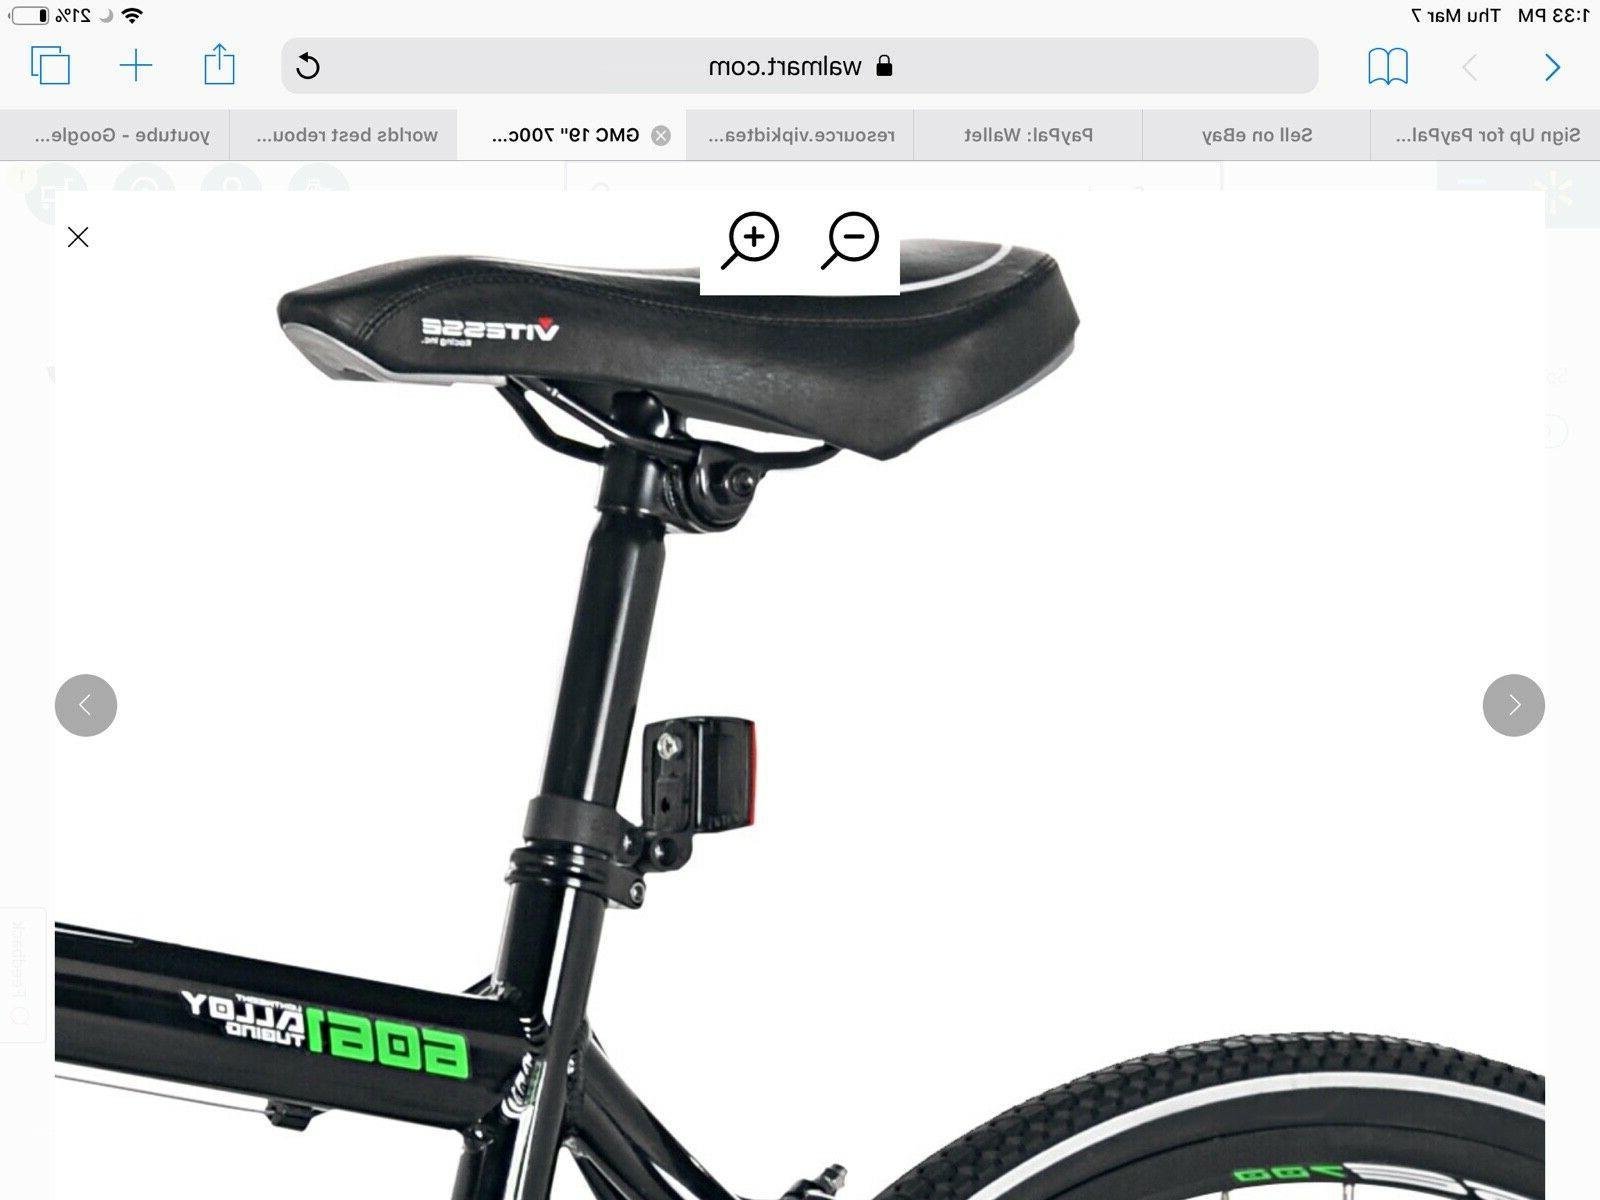 Denali Road Bike 28mm tires Bicycle Black/Green